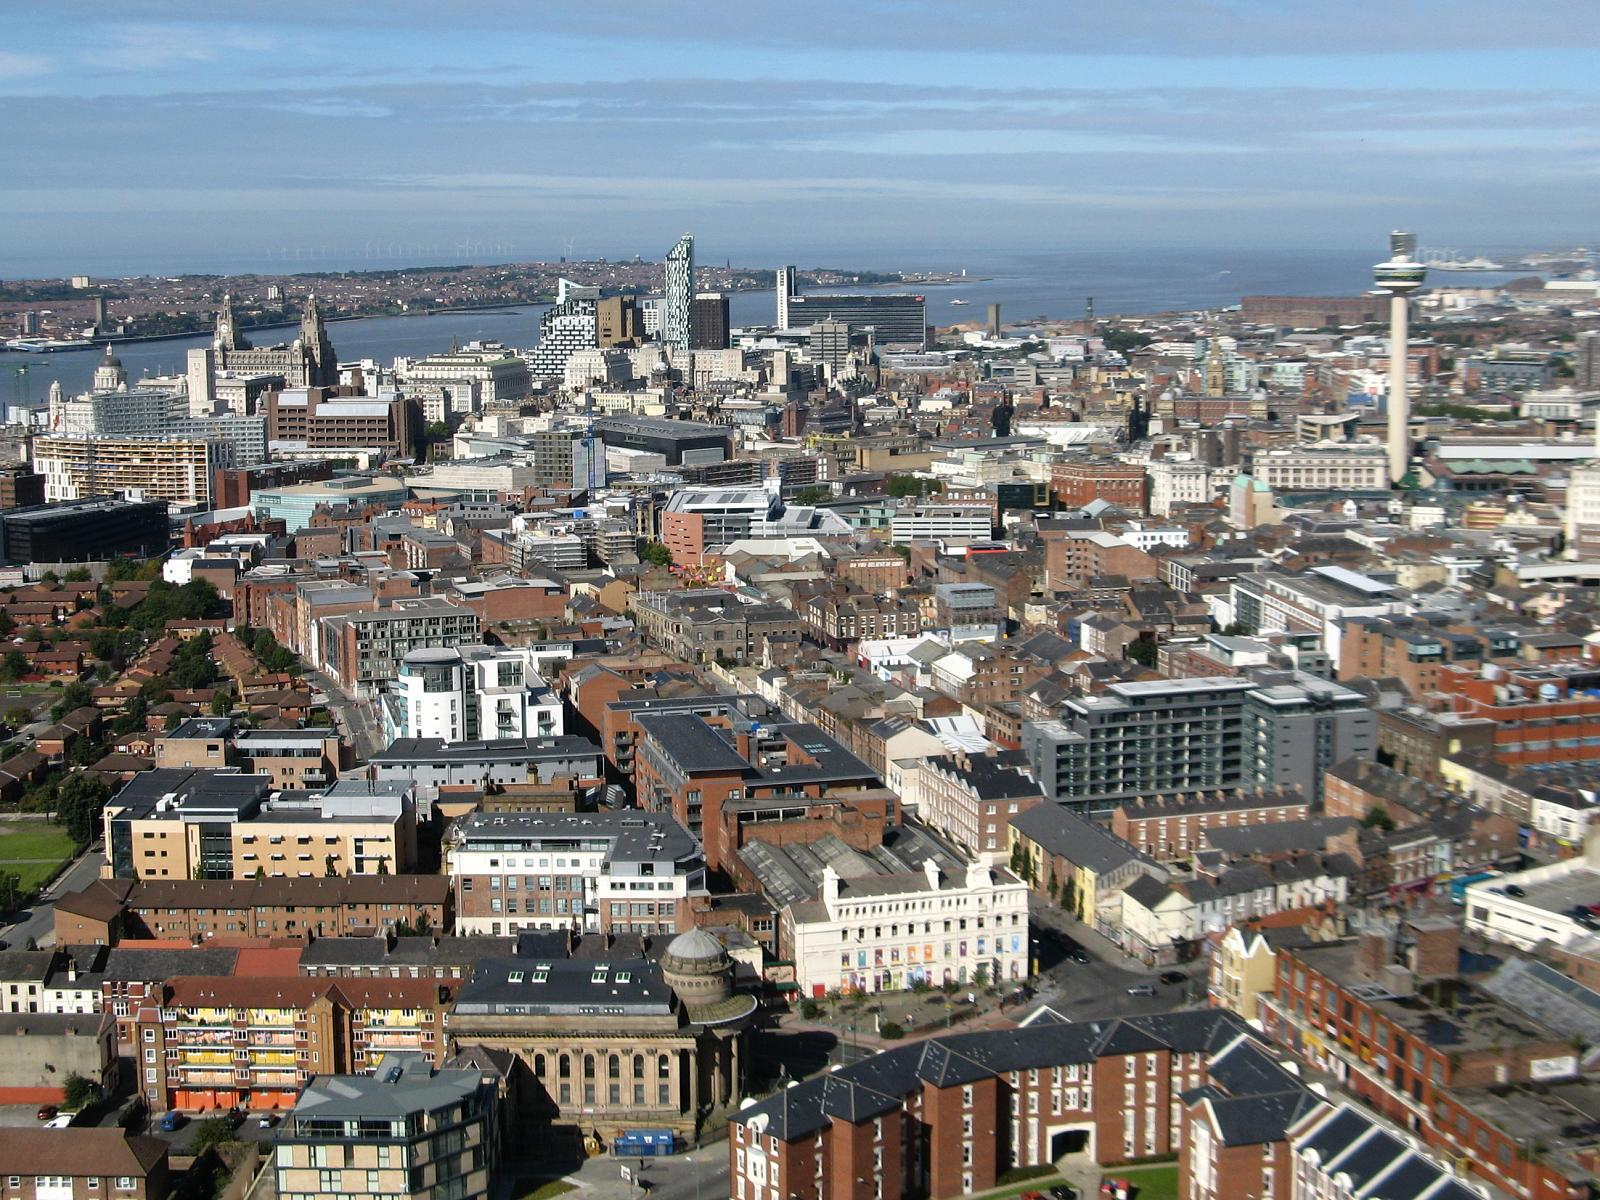 Liverpool city center